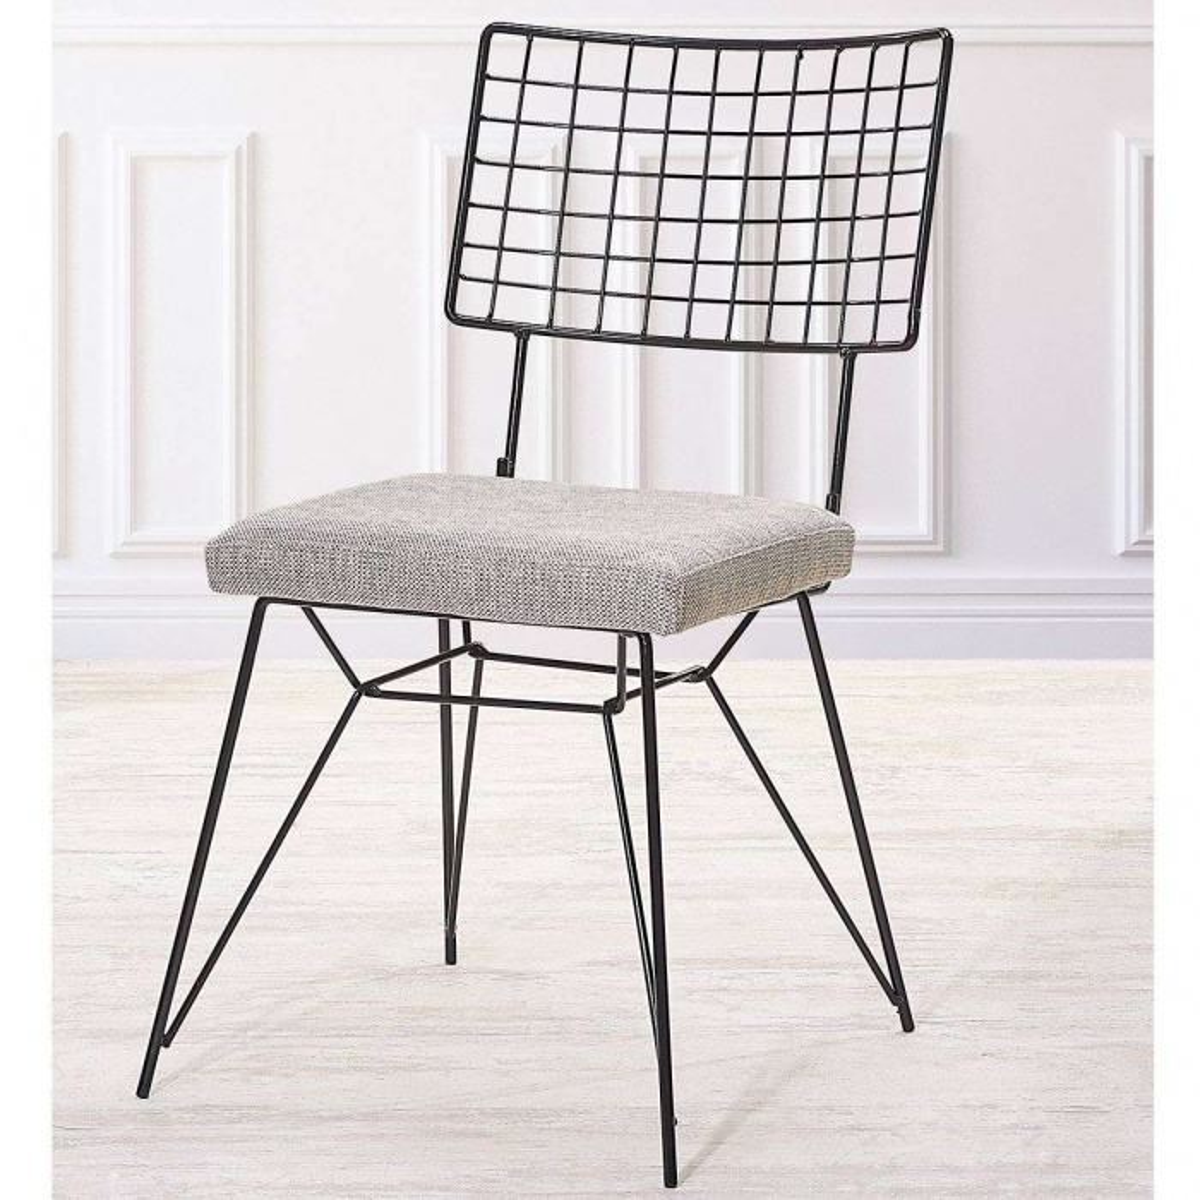 Siyah Demir Sandalye